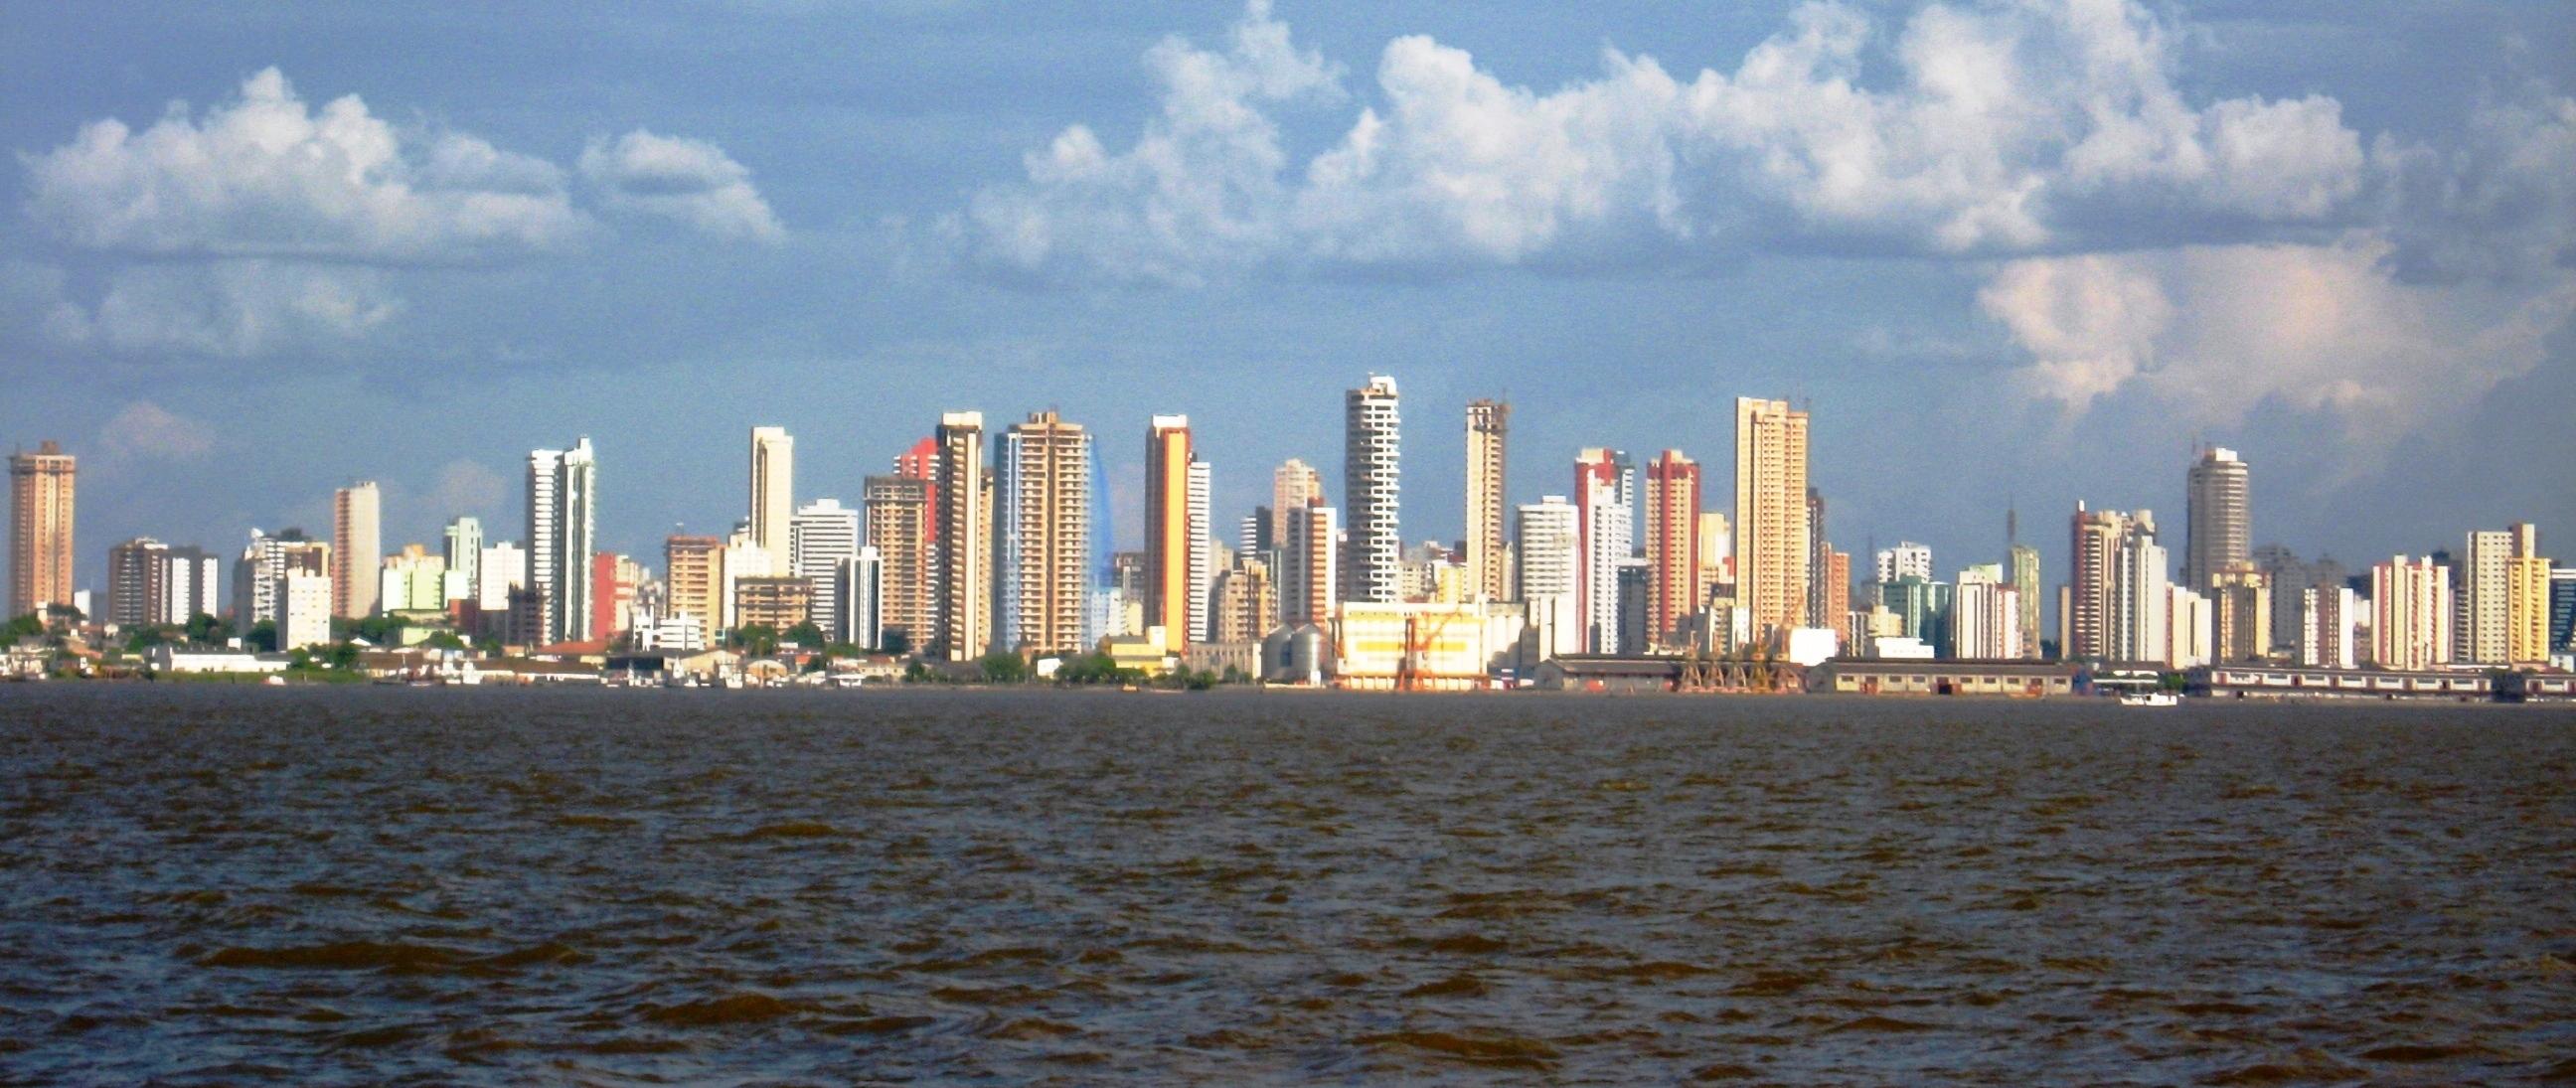 Famosos Belém in a photo - SkyscraperCity JW68